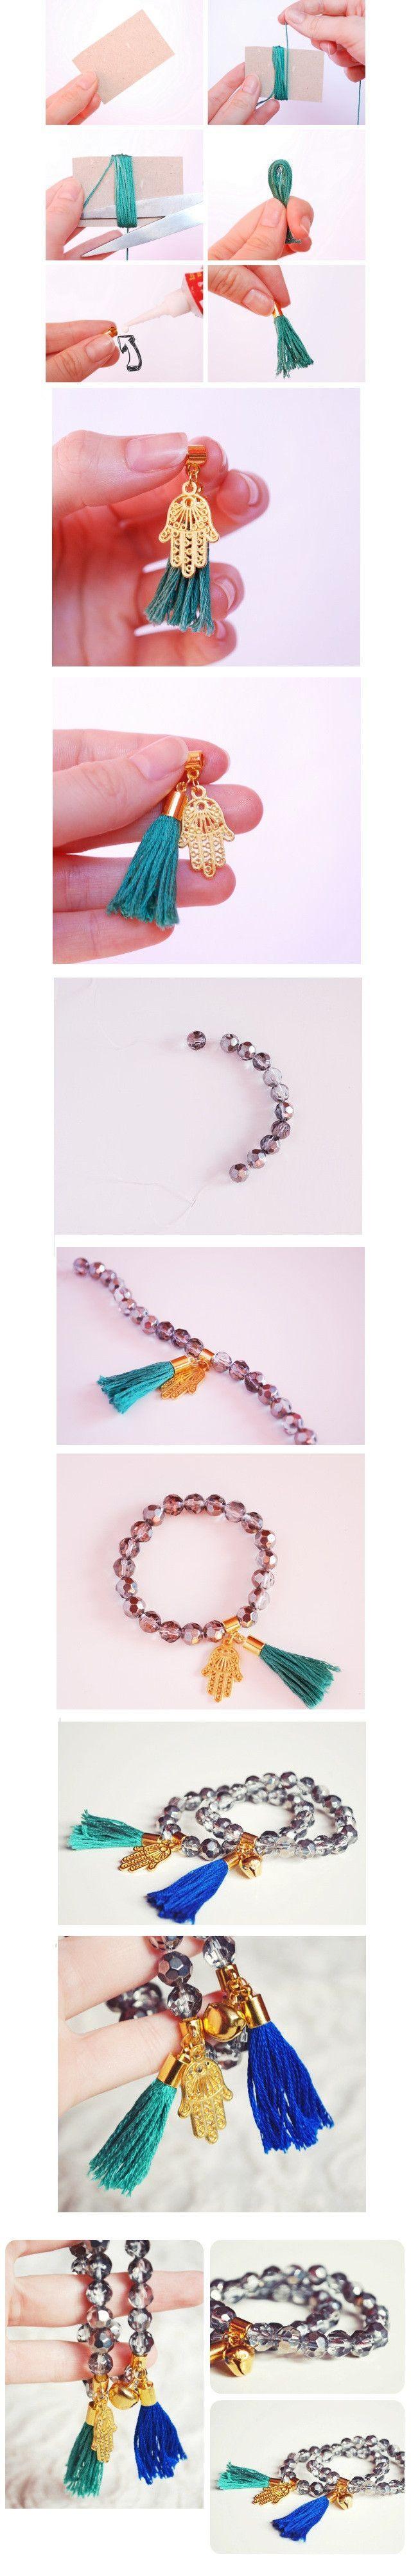 Tendance Bracelets DIY silver and gold bracelets with tassels (DIY Creative Ideas)